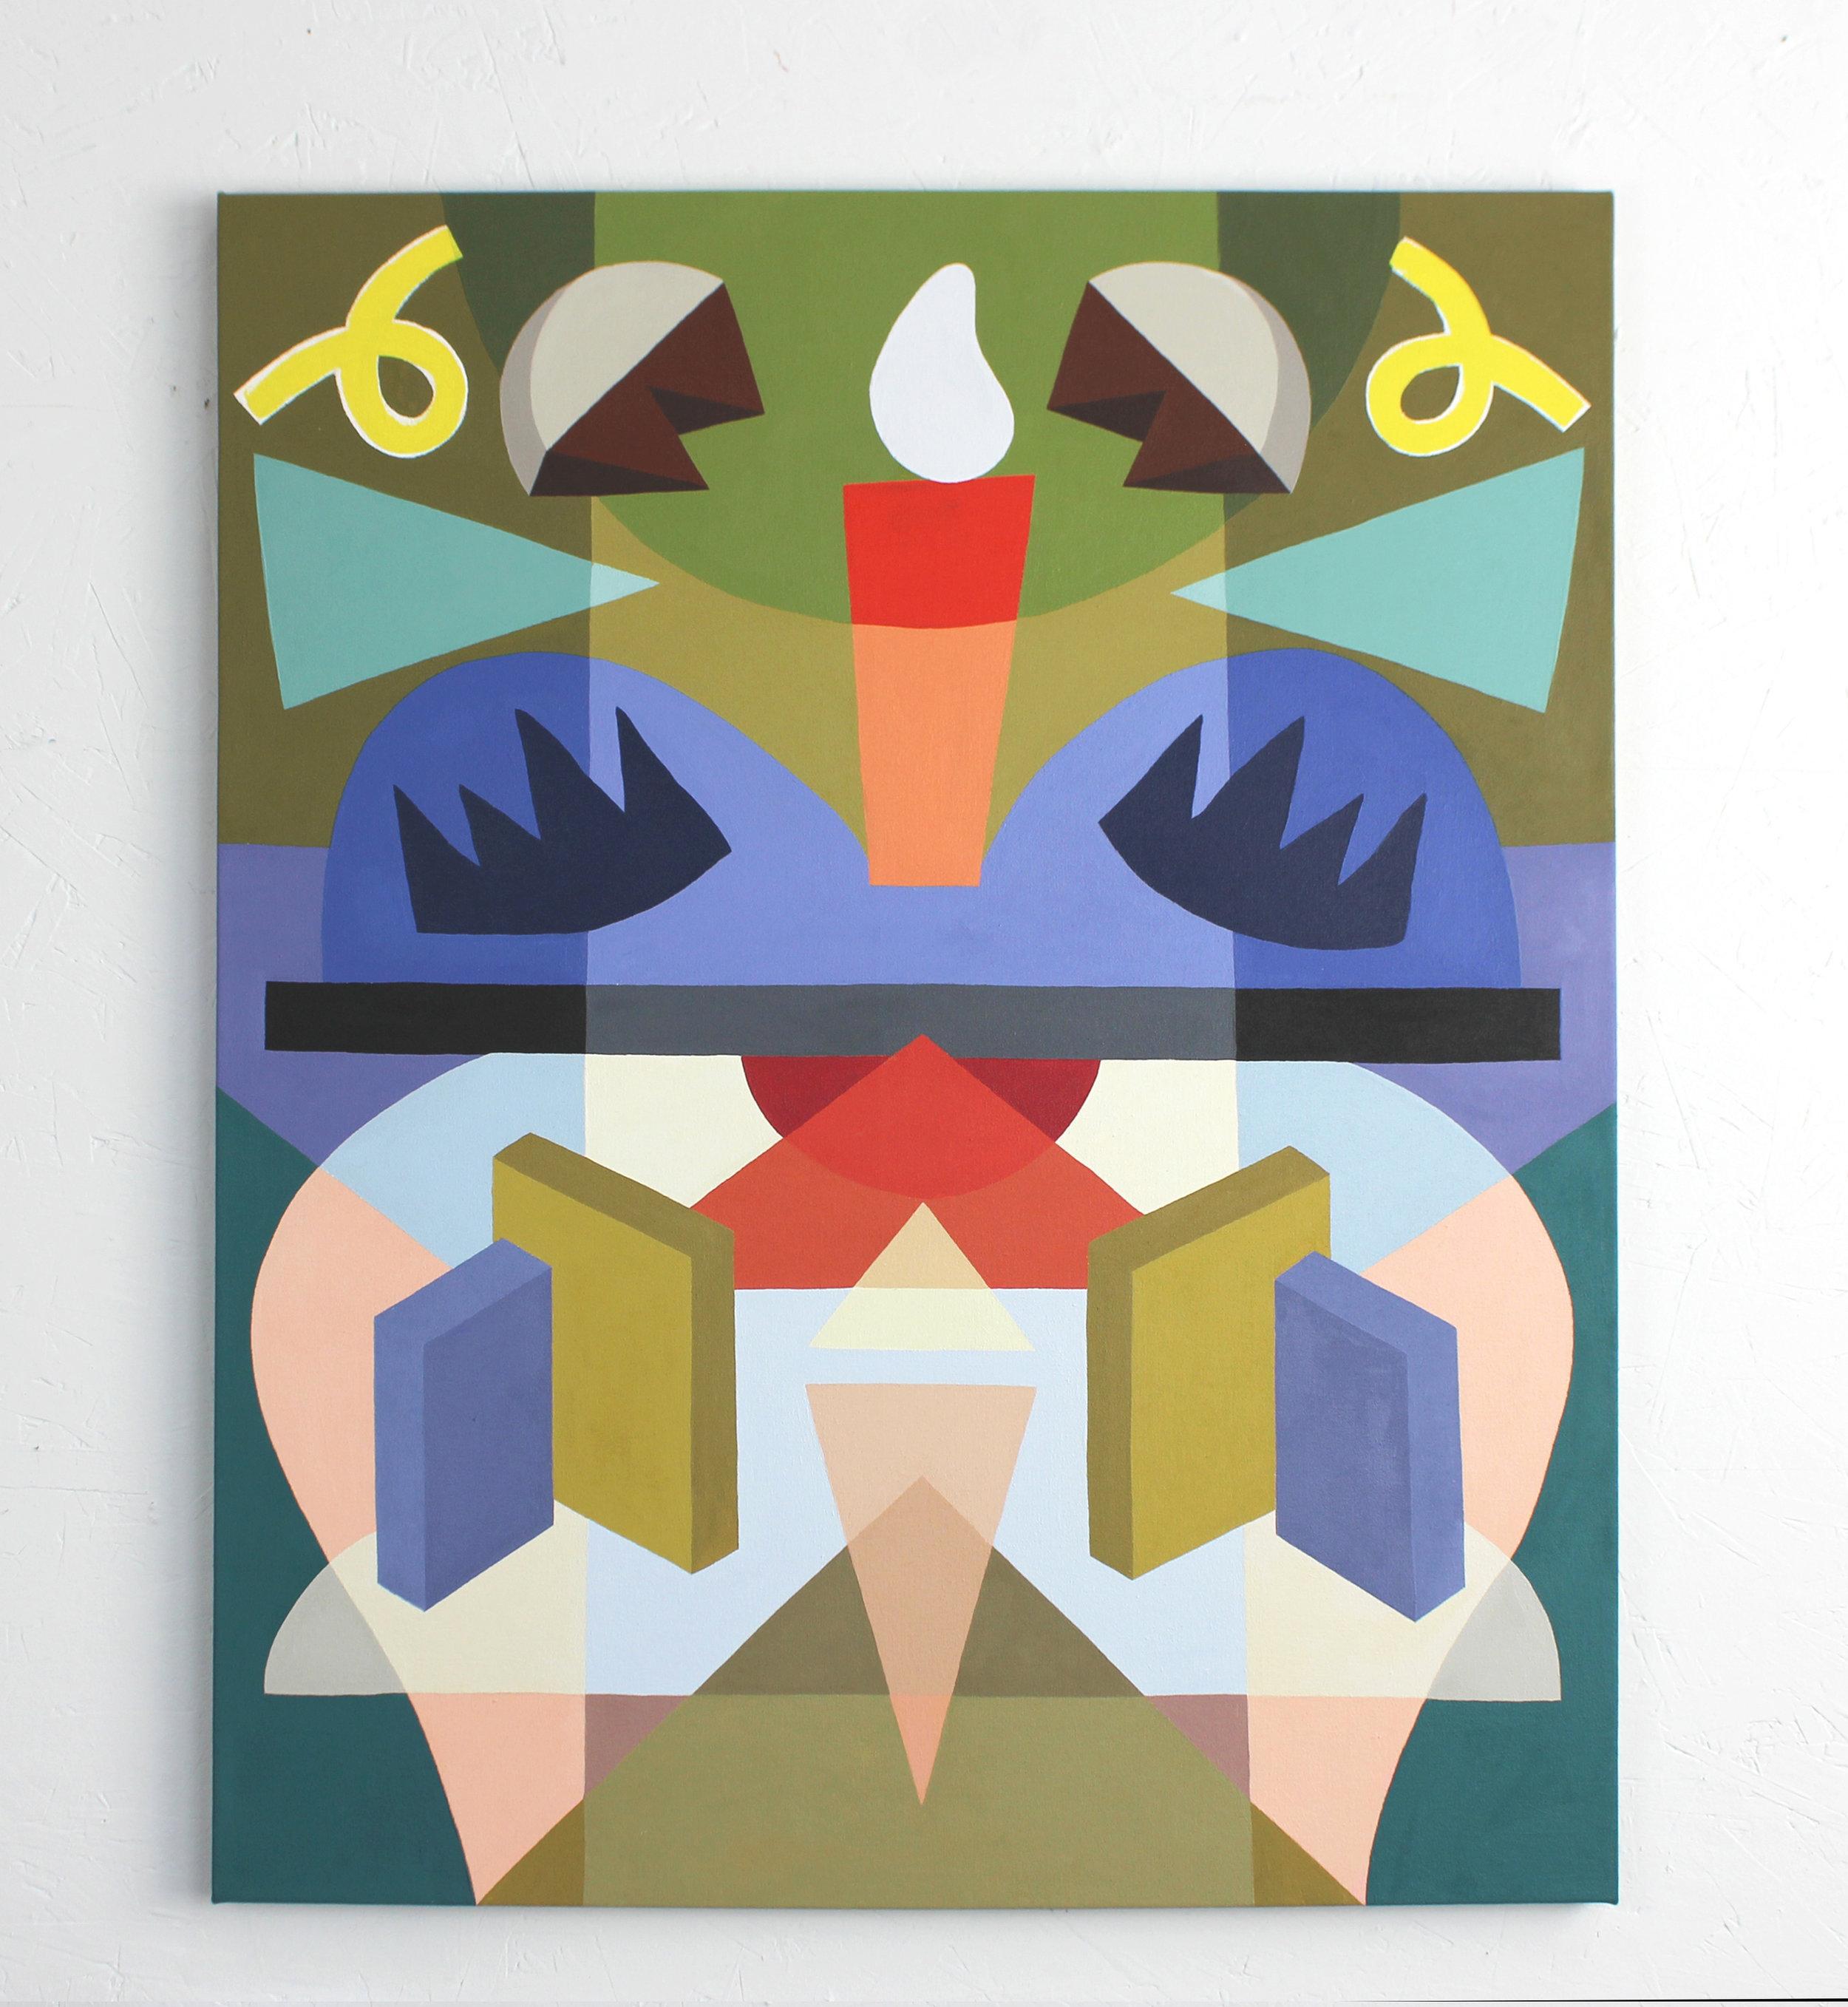 Opposite Symmetry #4  Acrylic on canvas. 2019